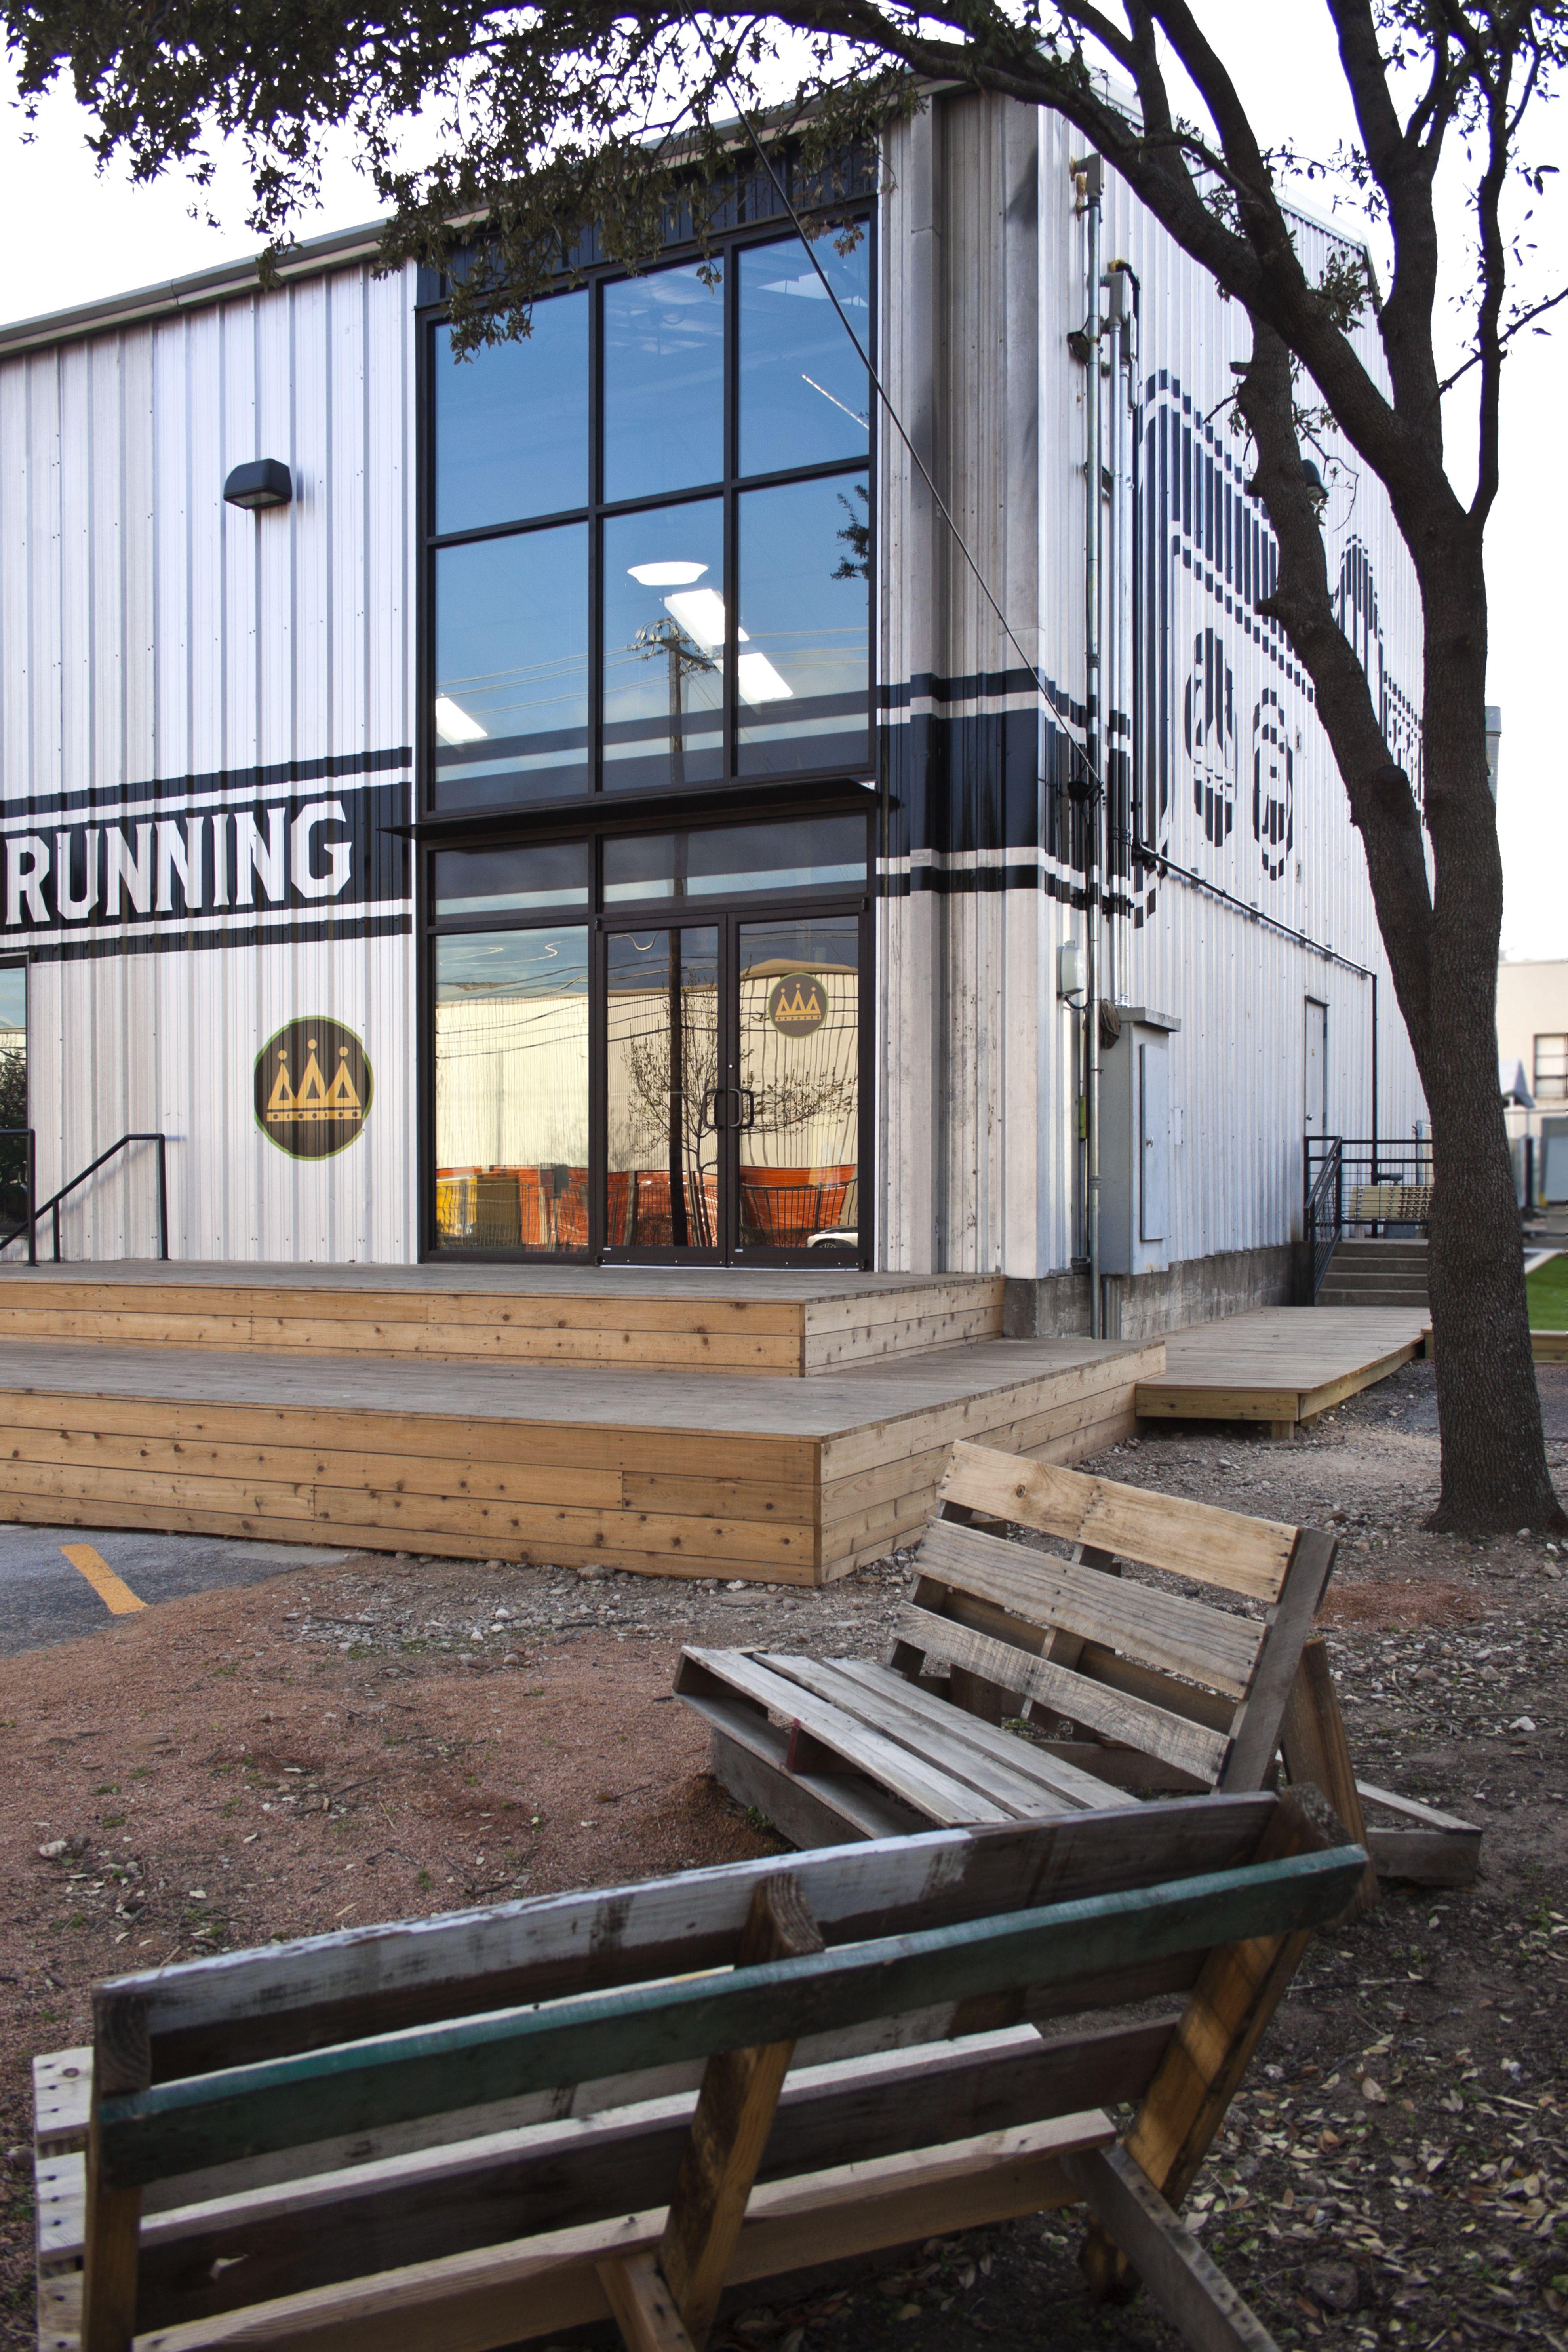 410 Speed Shop. Running Gear Retail Store In Downtown